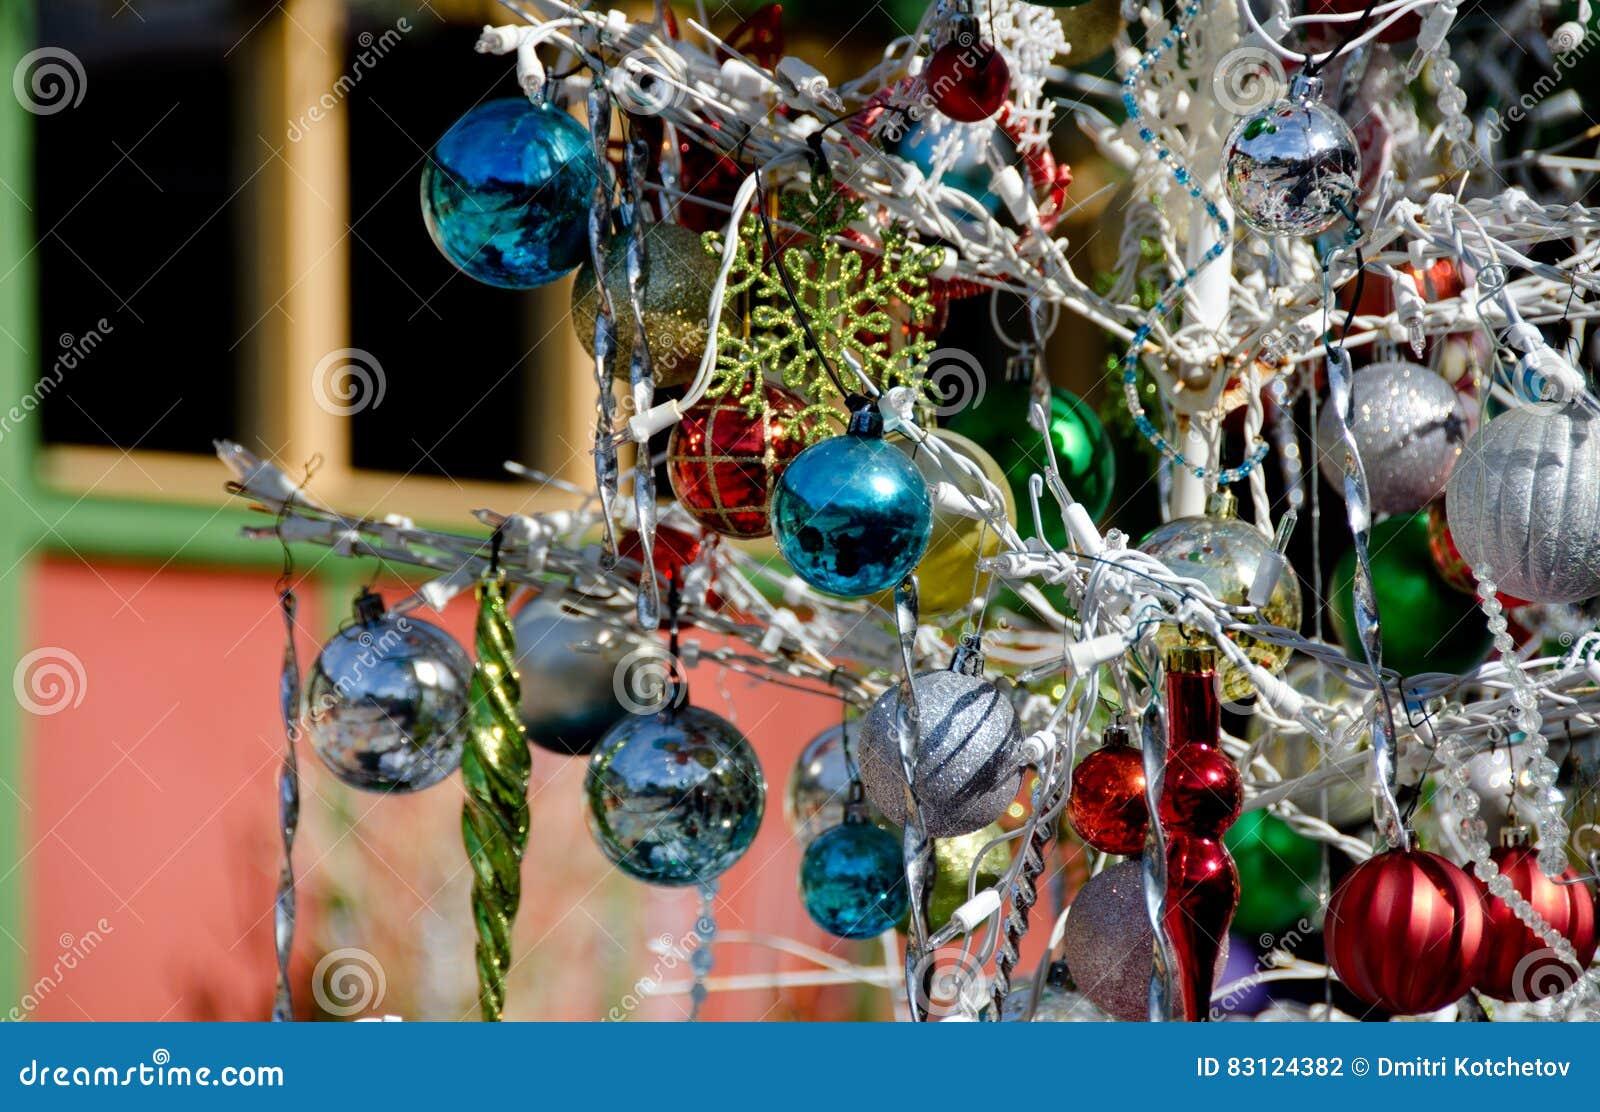 Christmas Decorations In Spanish Art Village - 4 Stock Photo - Image ...